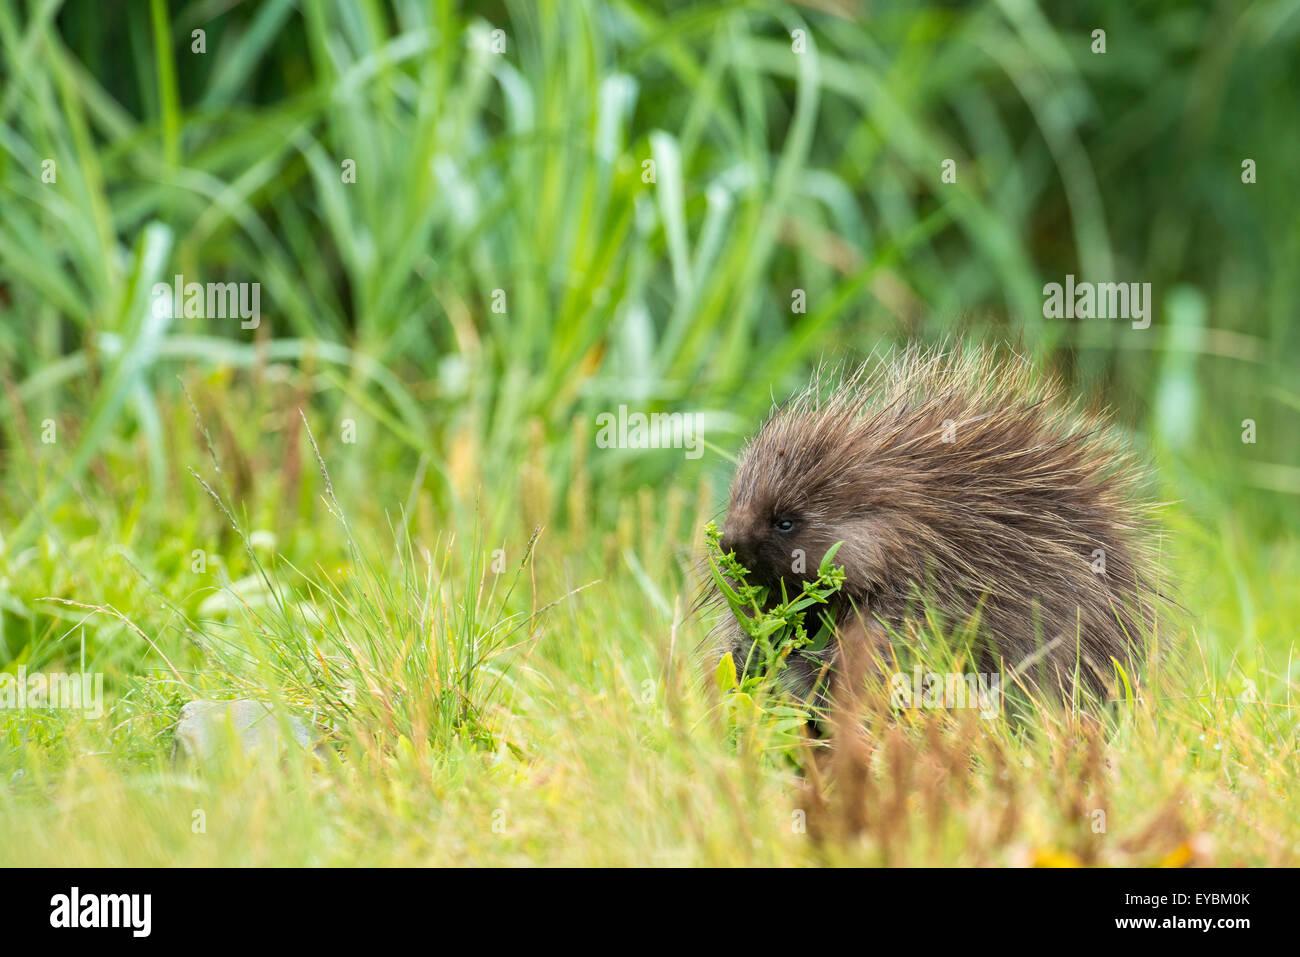 North American Porcupine (Erethizon dorsatum), Glacier Bay National Park, Alaska, USA Stock Photo